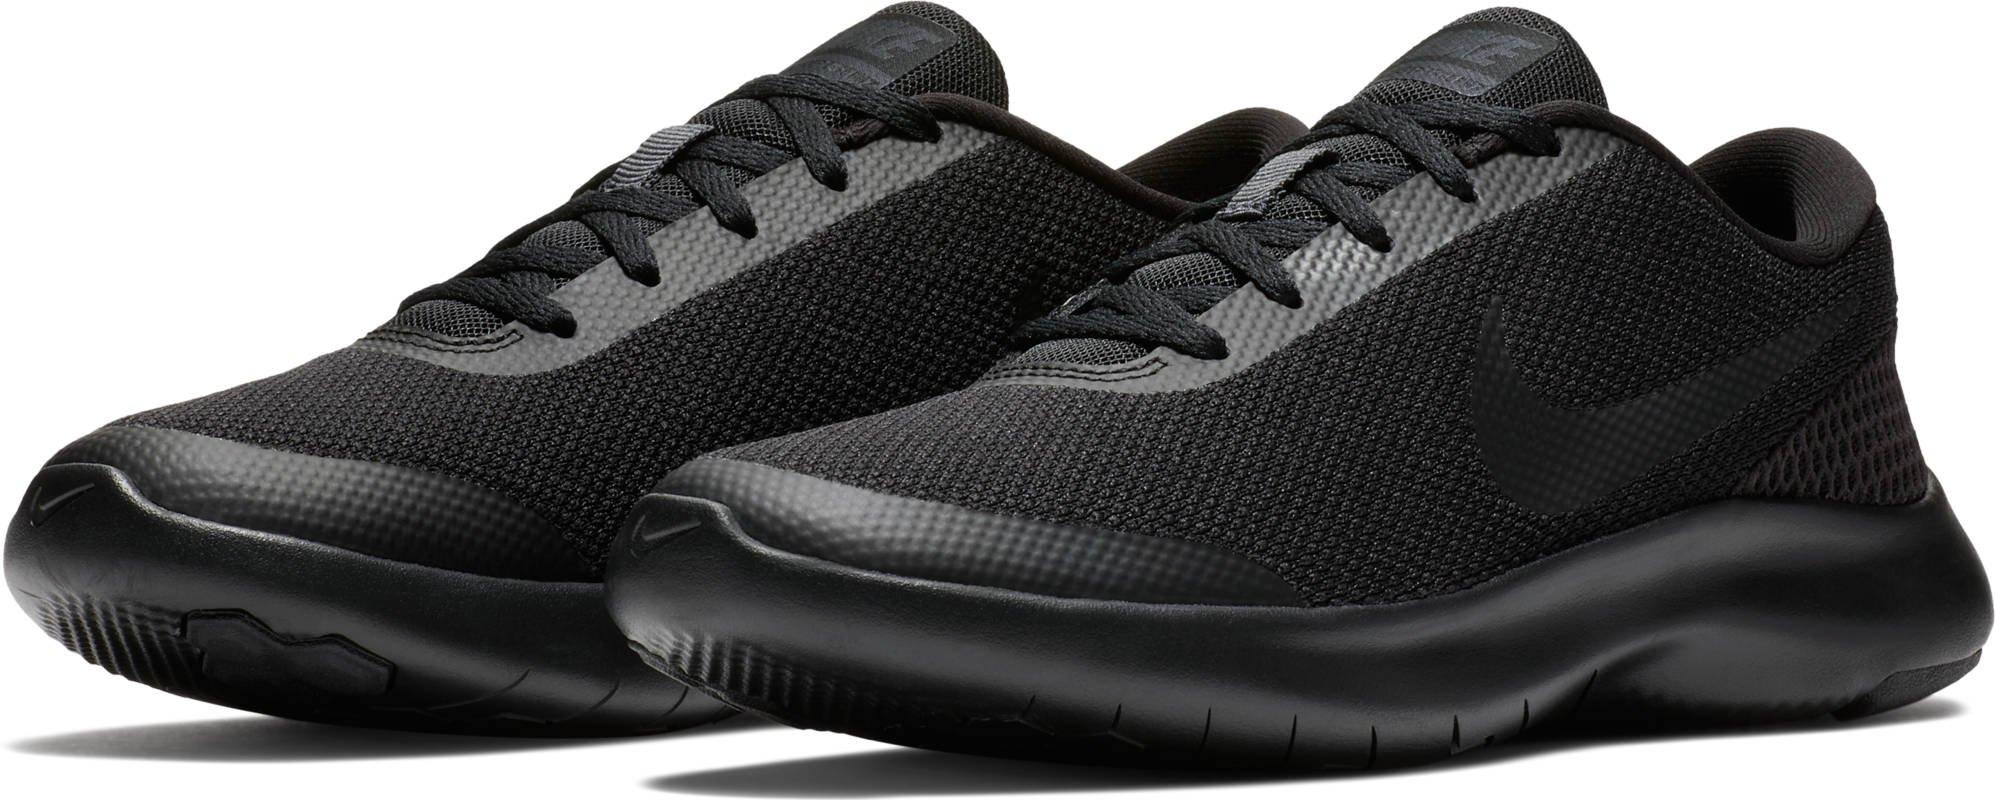 NIKE Women's Flex Experience RN 7 Running Shoes (7.5 B US, Black/Black-anthacite)